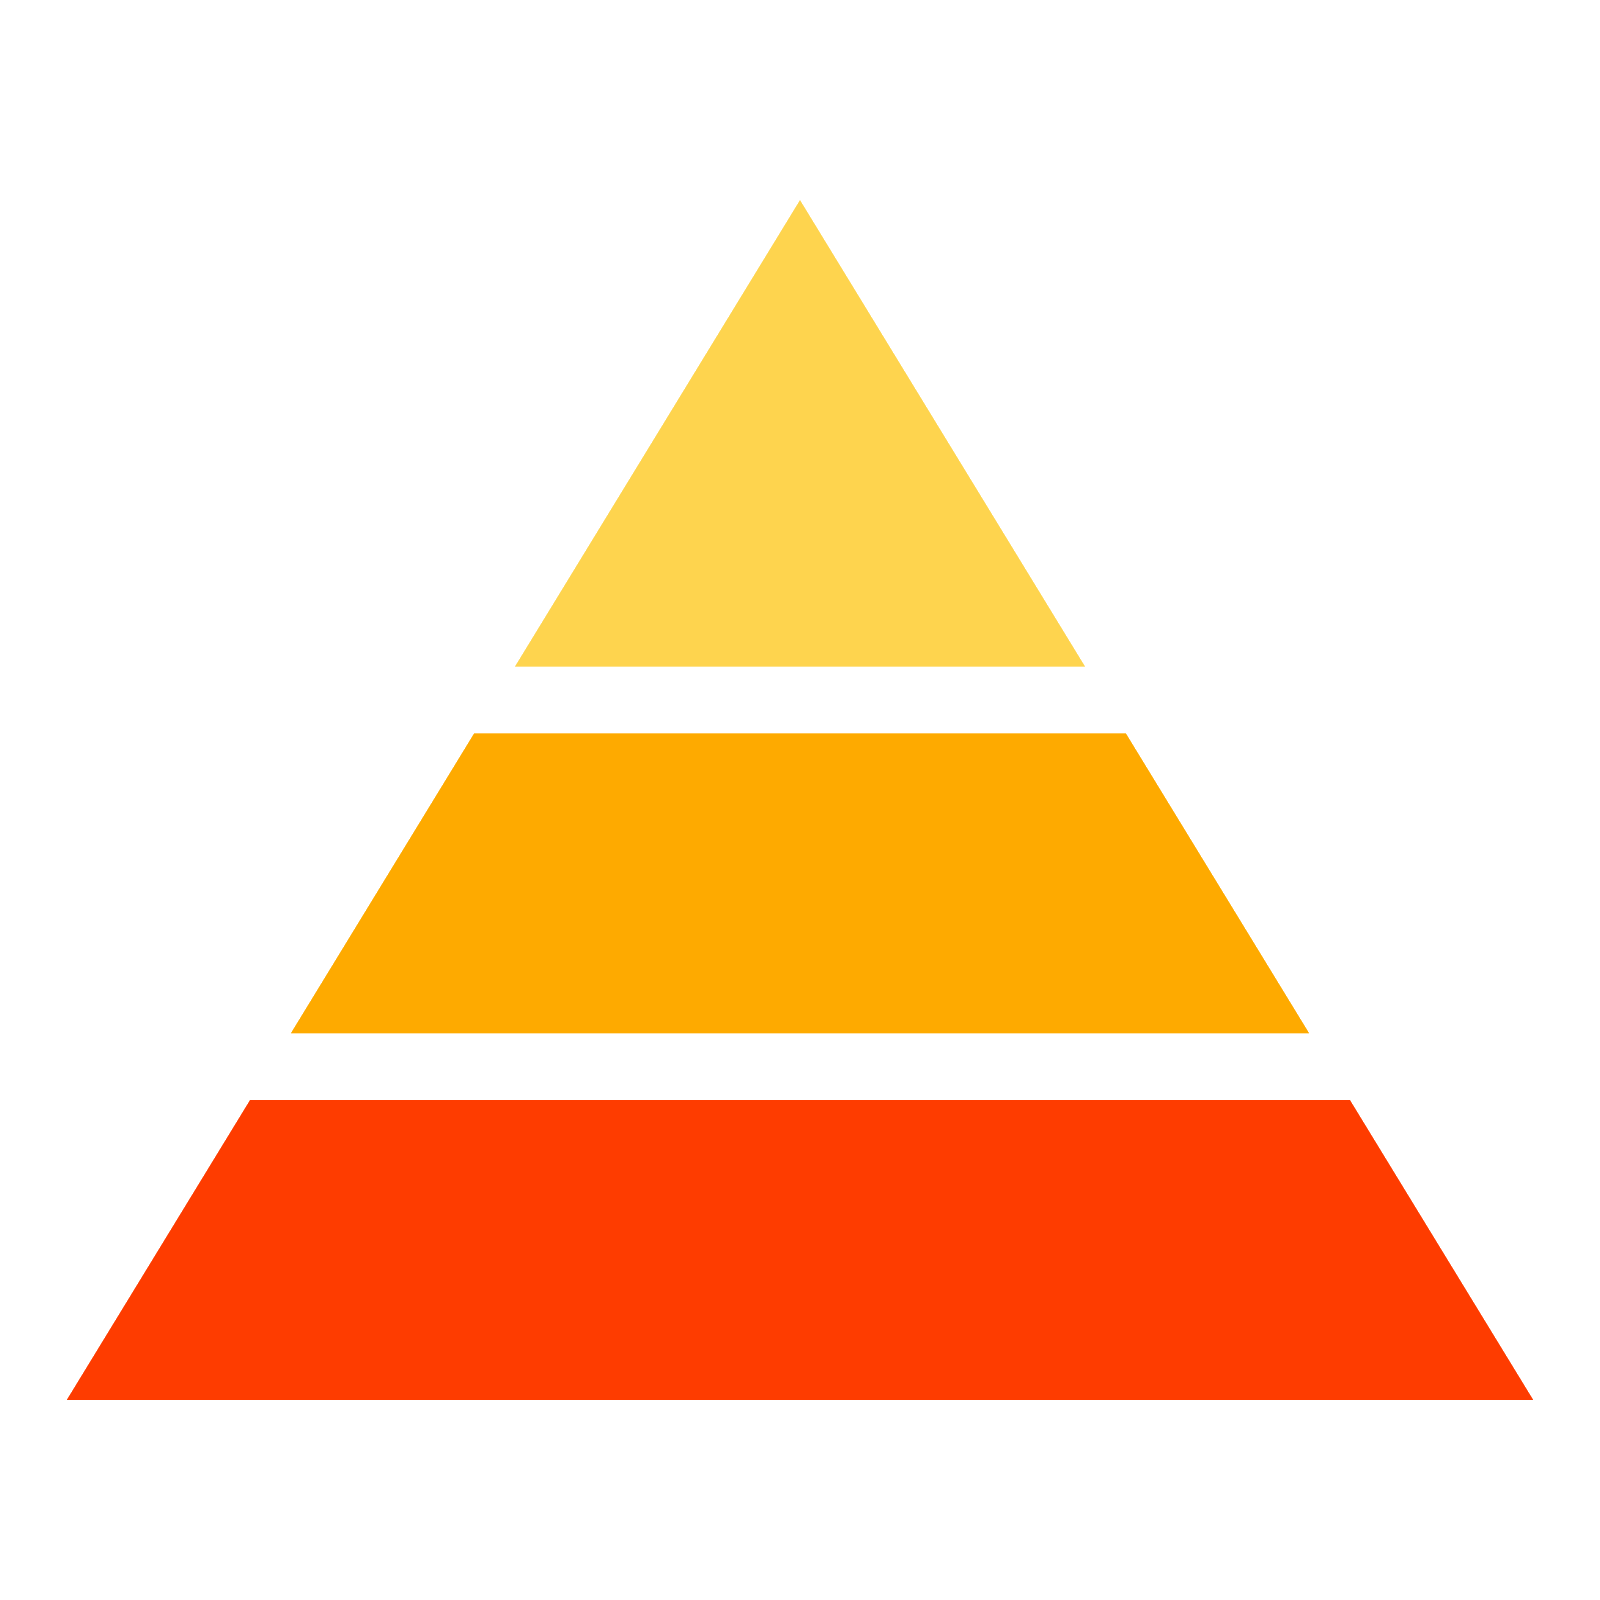 Egyptian pyramids computer icons. Egypt clipart triangle pyramid